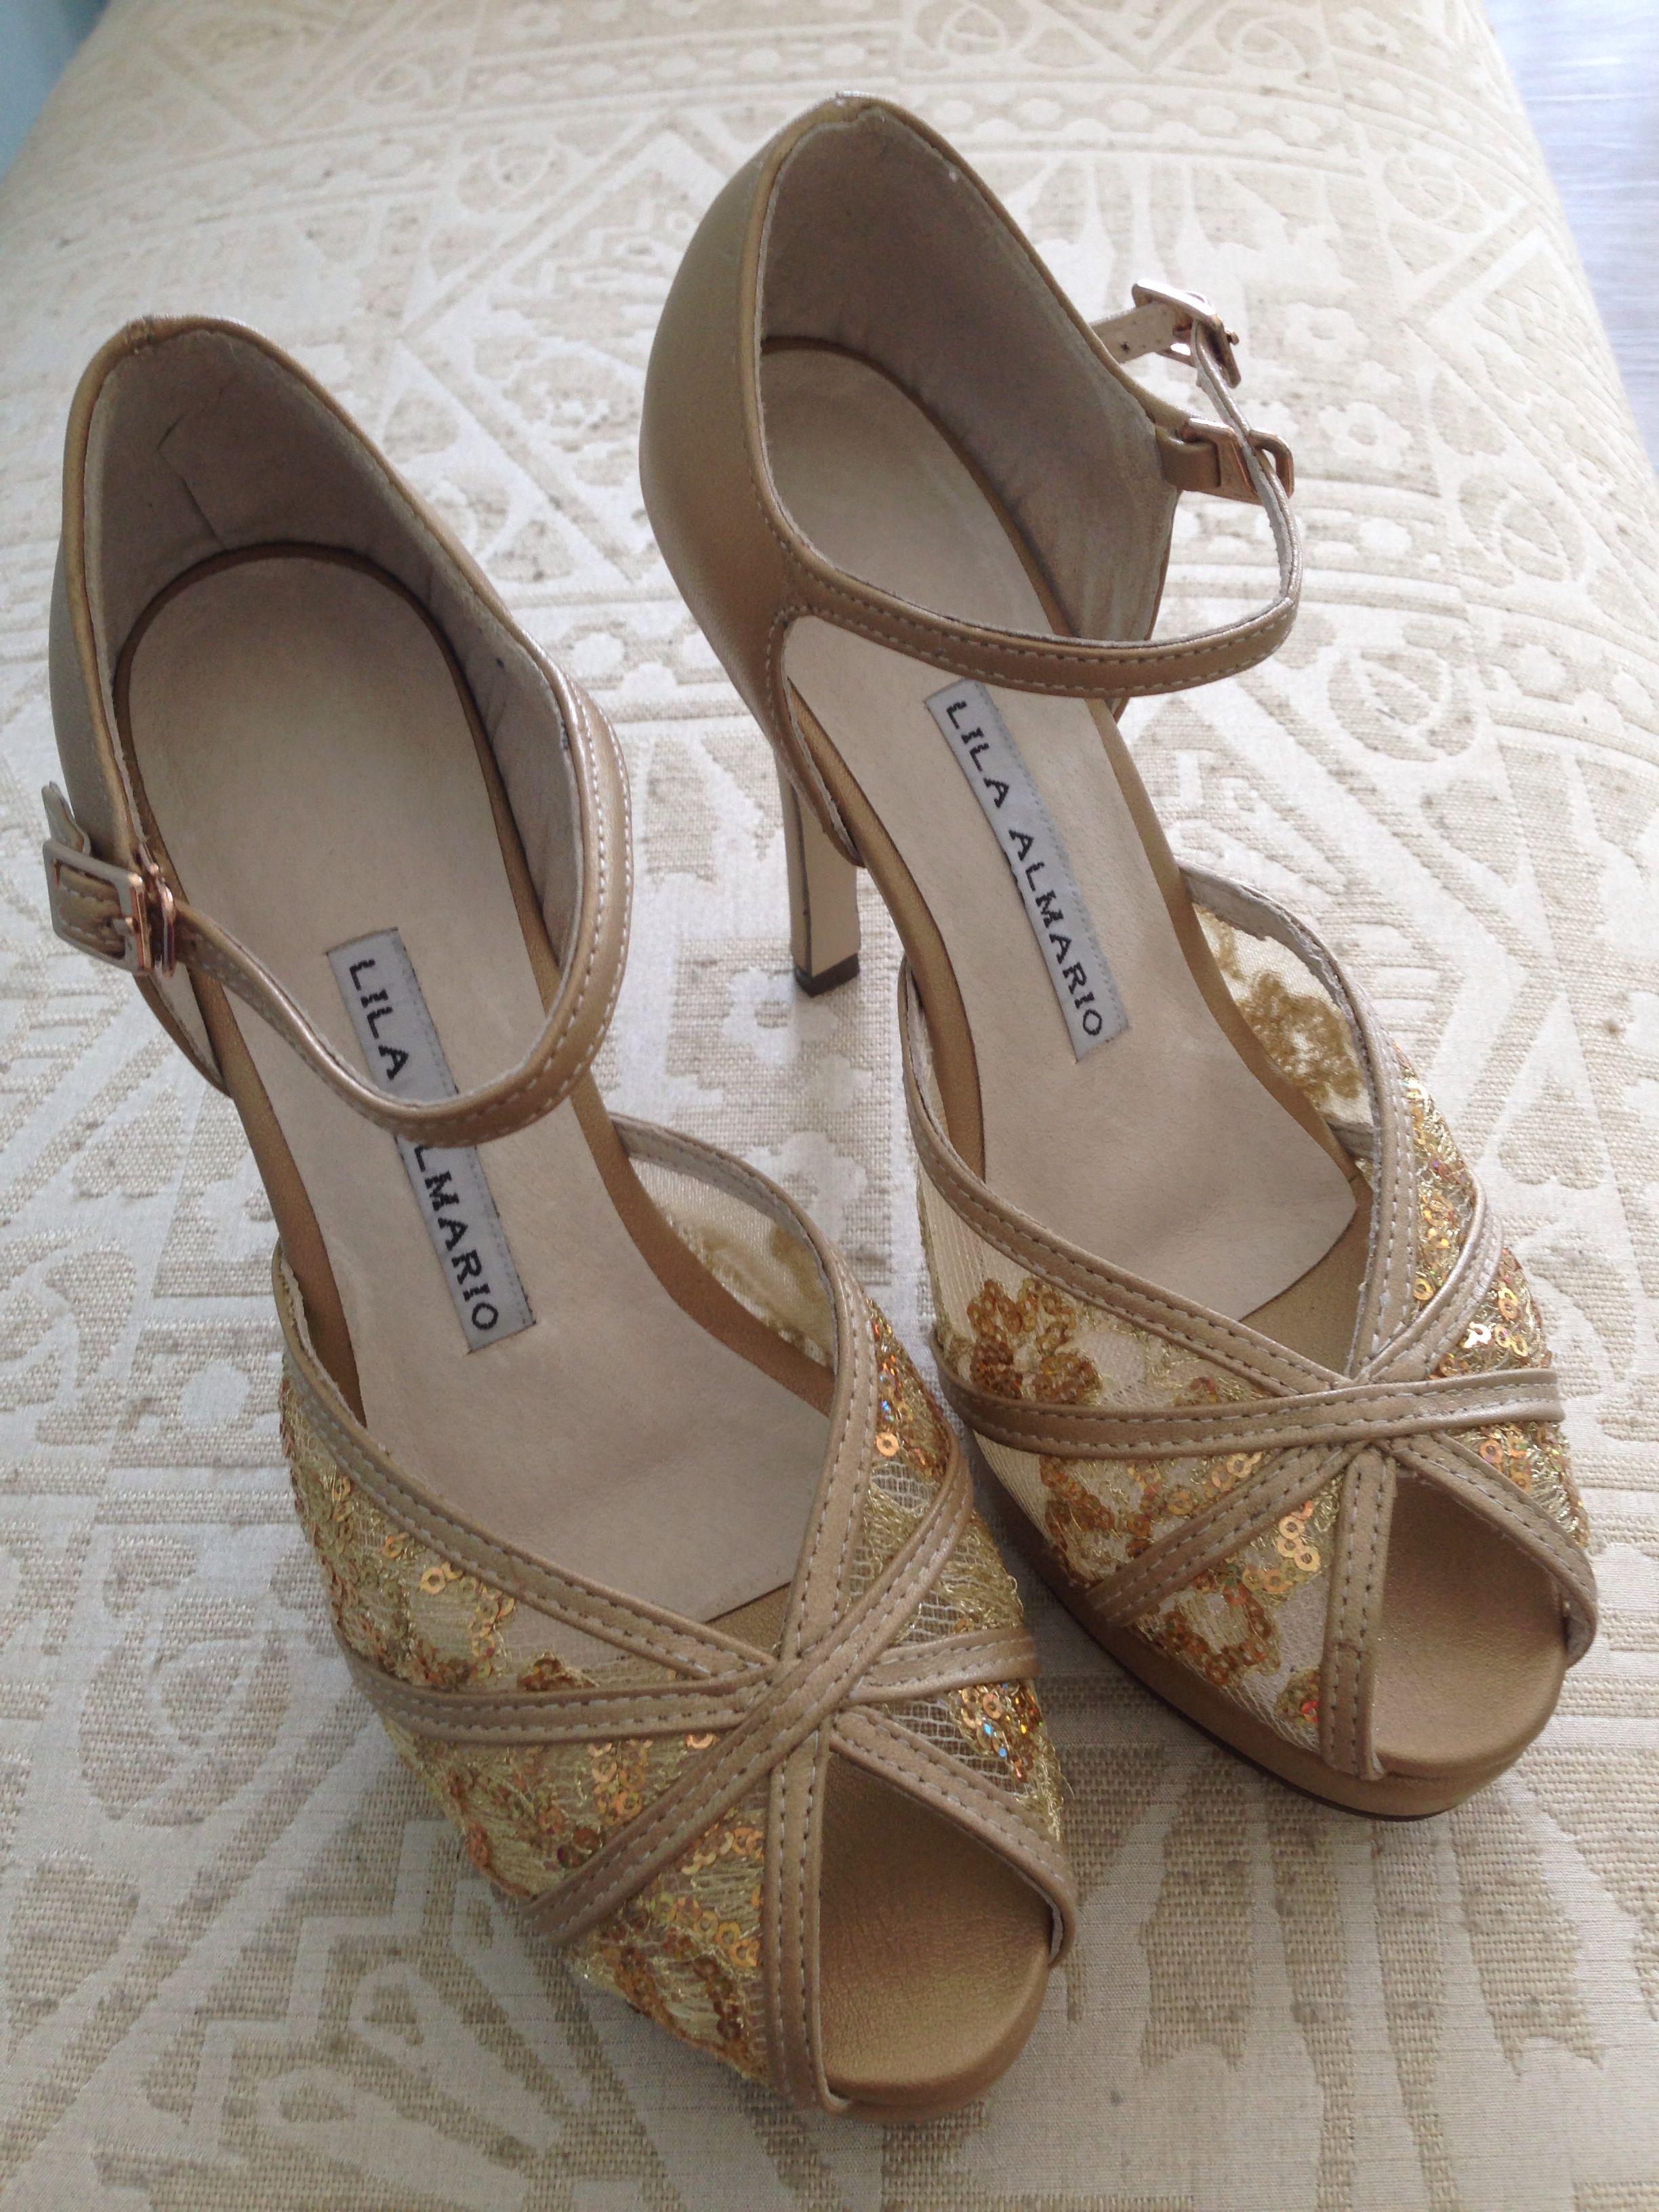 my wedding shoes made by lila almario